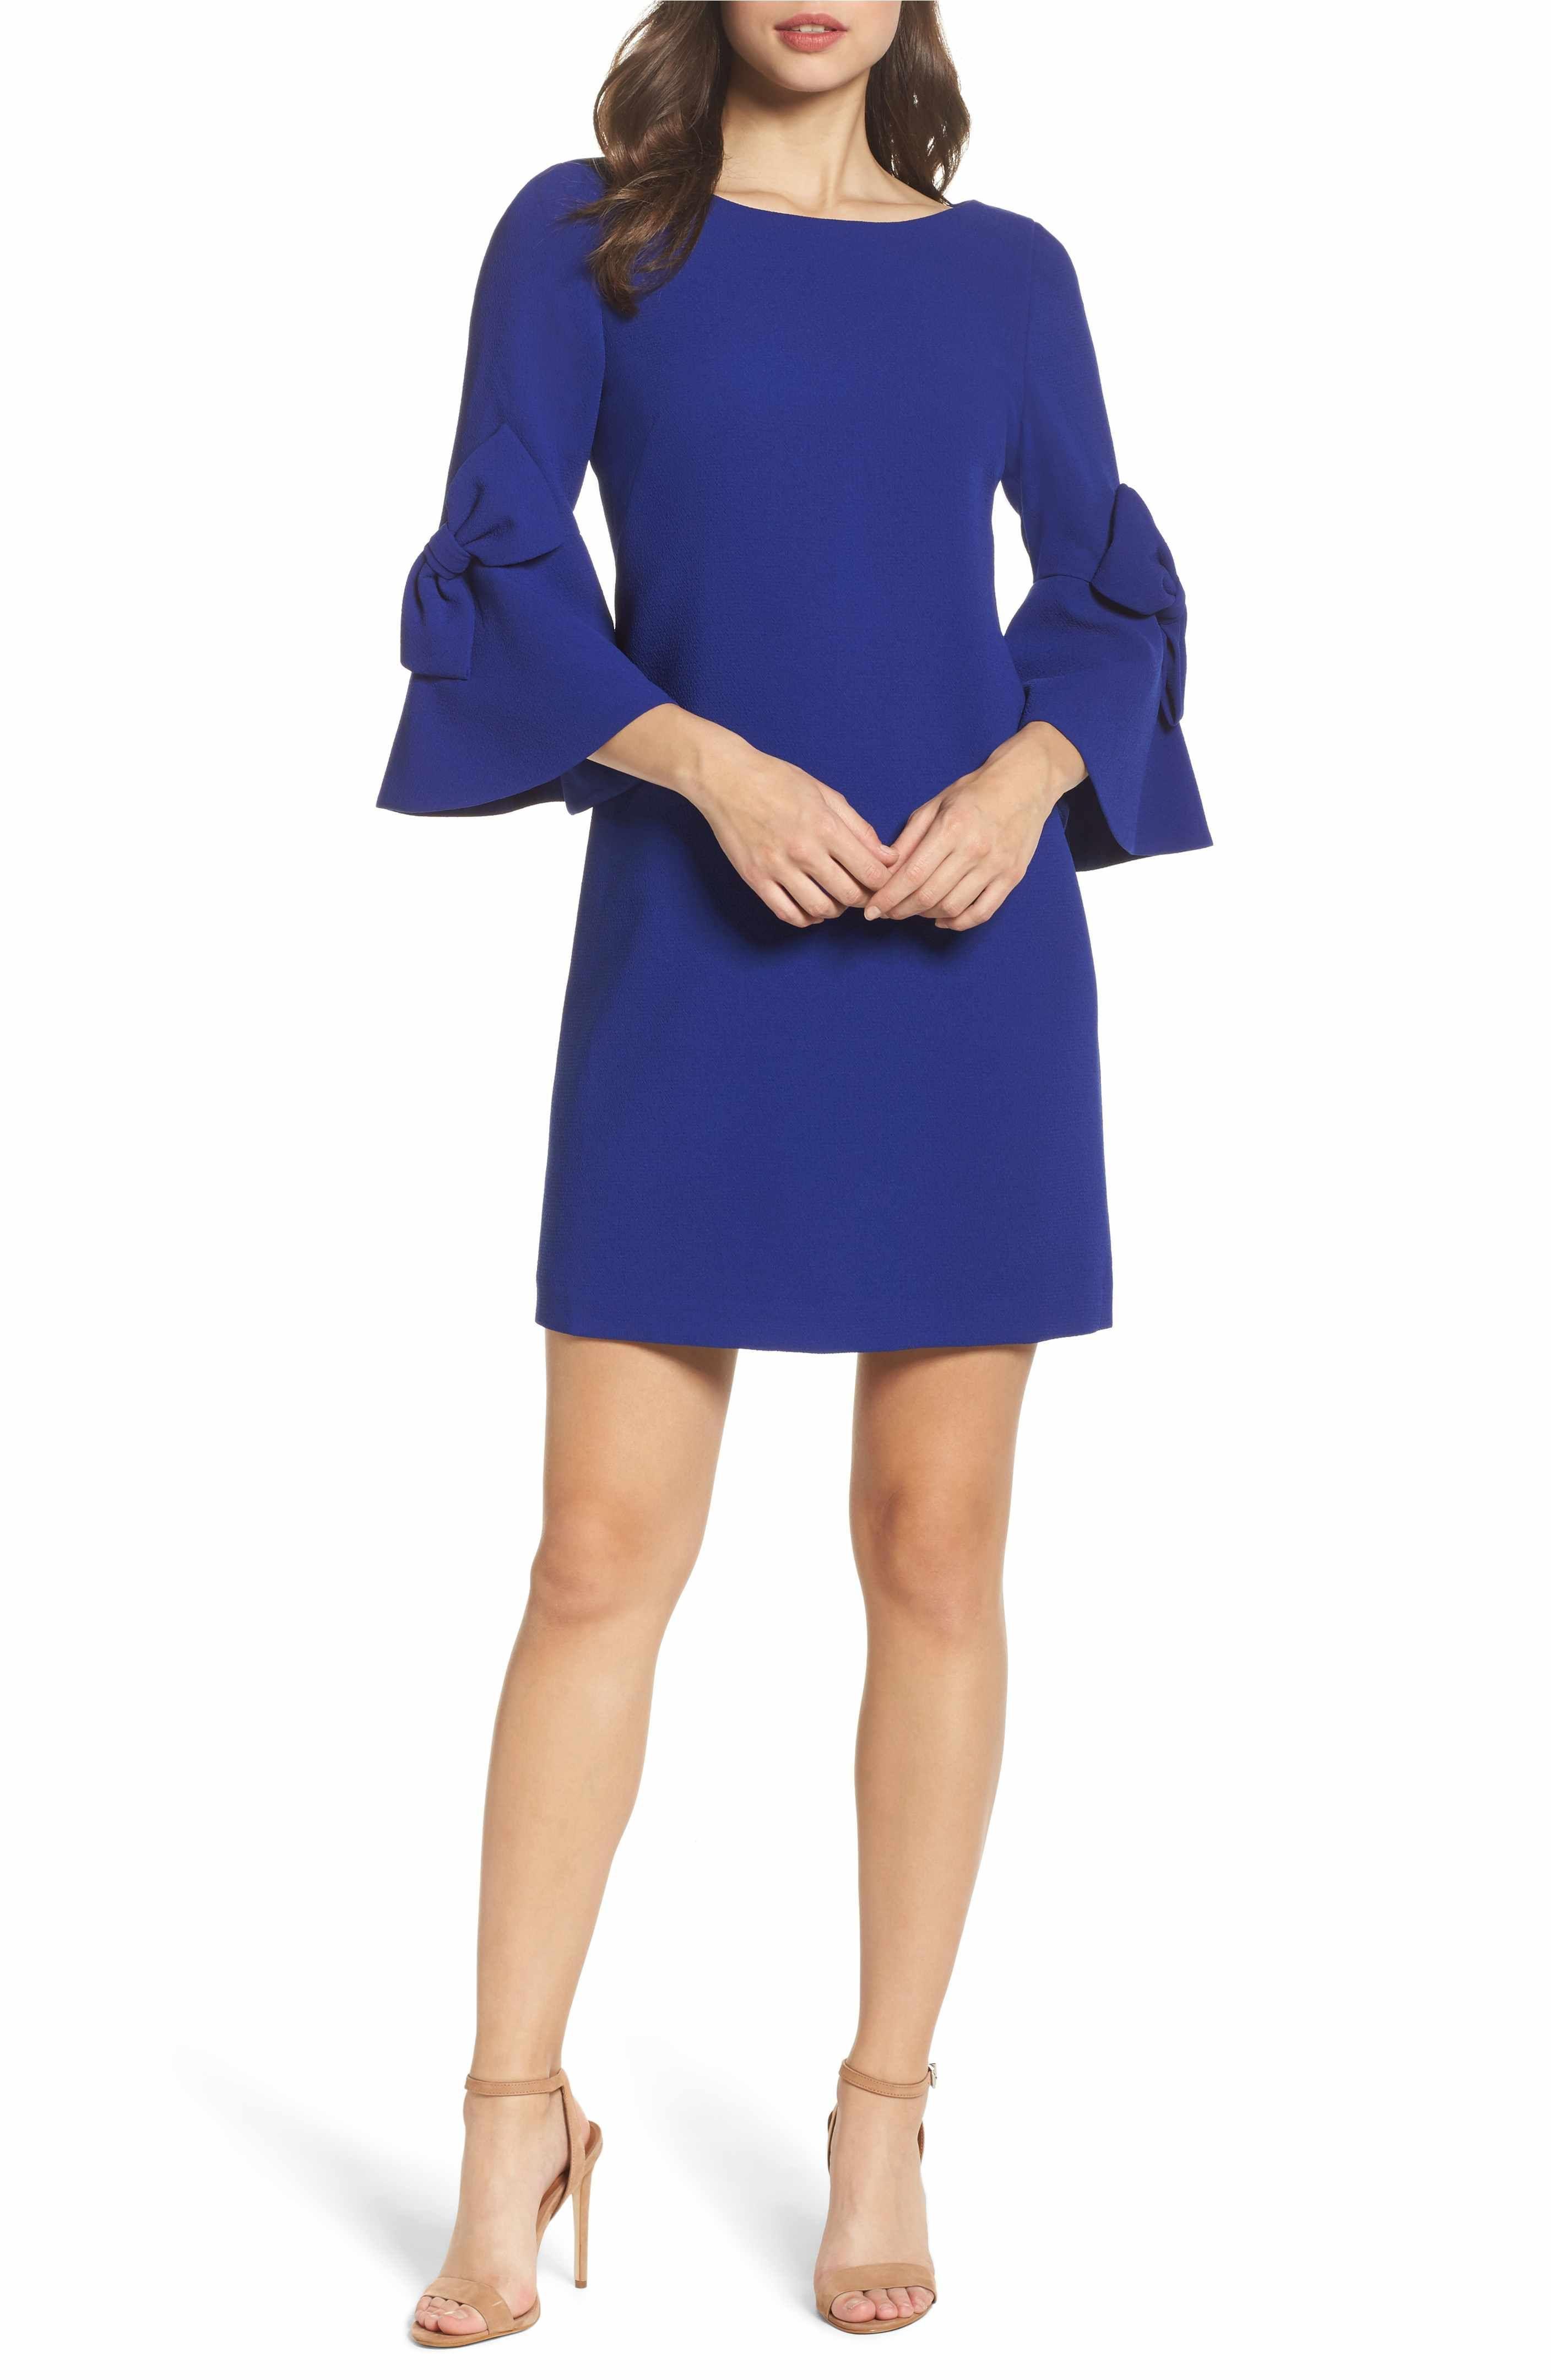 ae6125d1 Main Image - Eliza J Bell Sleeve Shift Dress (Regular & Petite ...